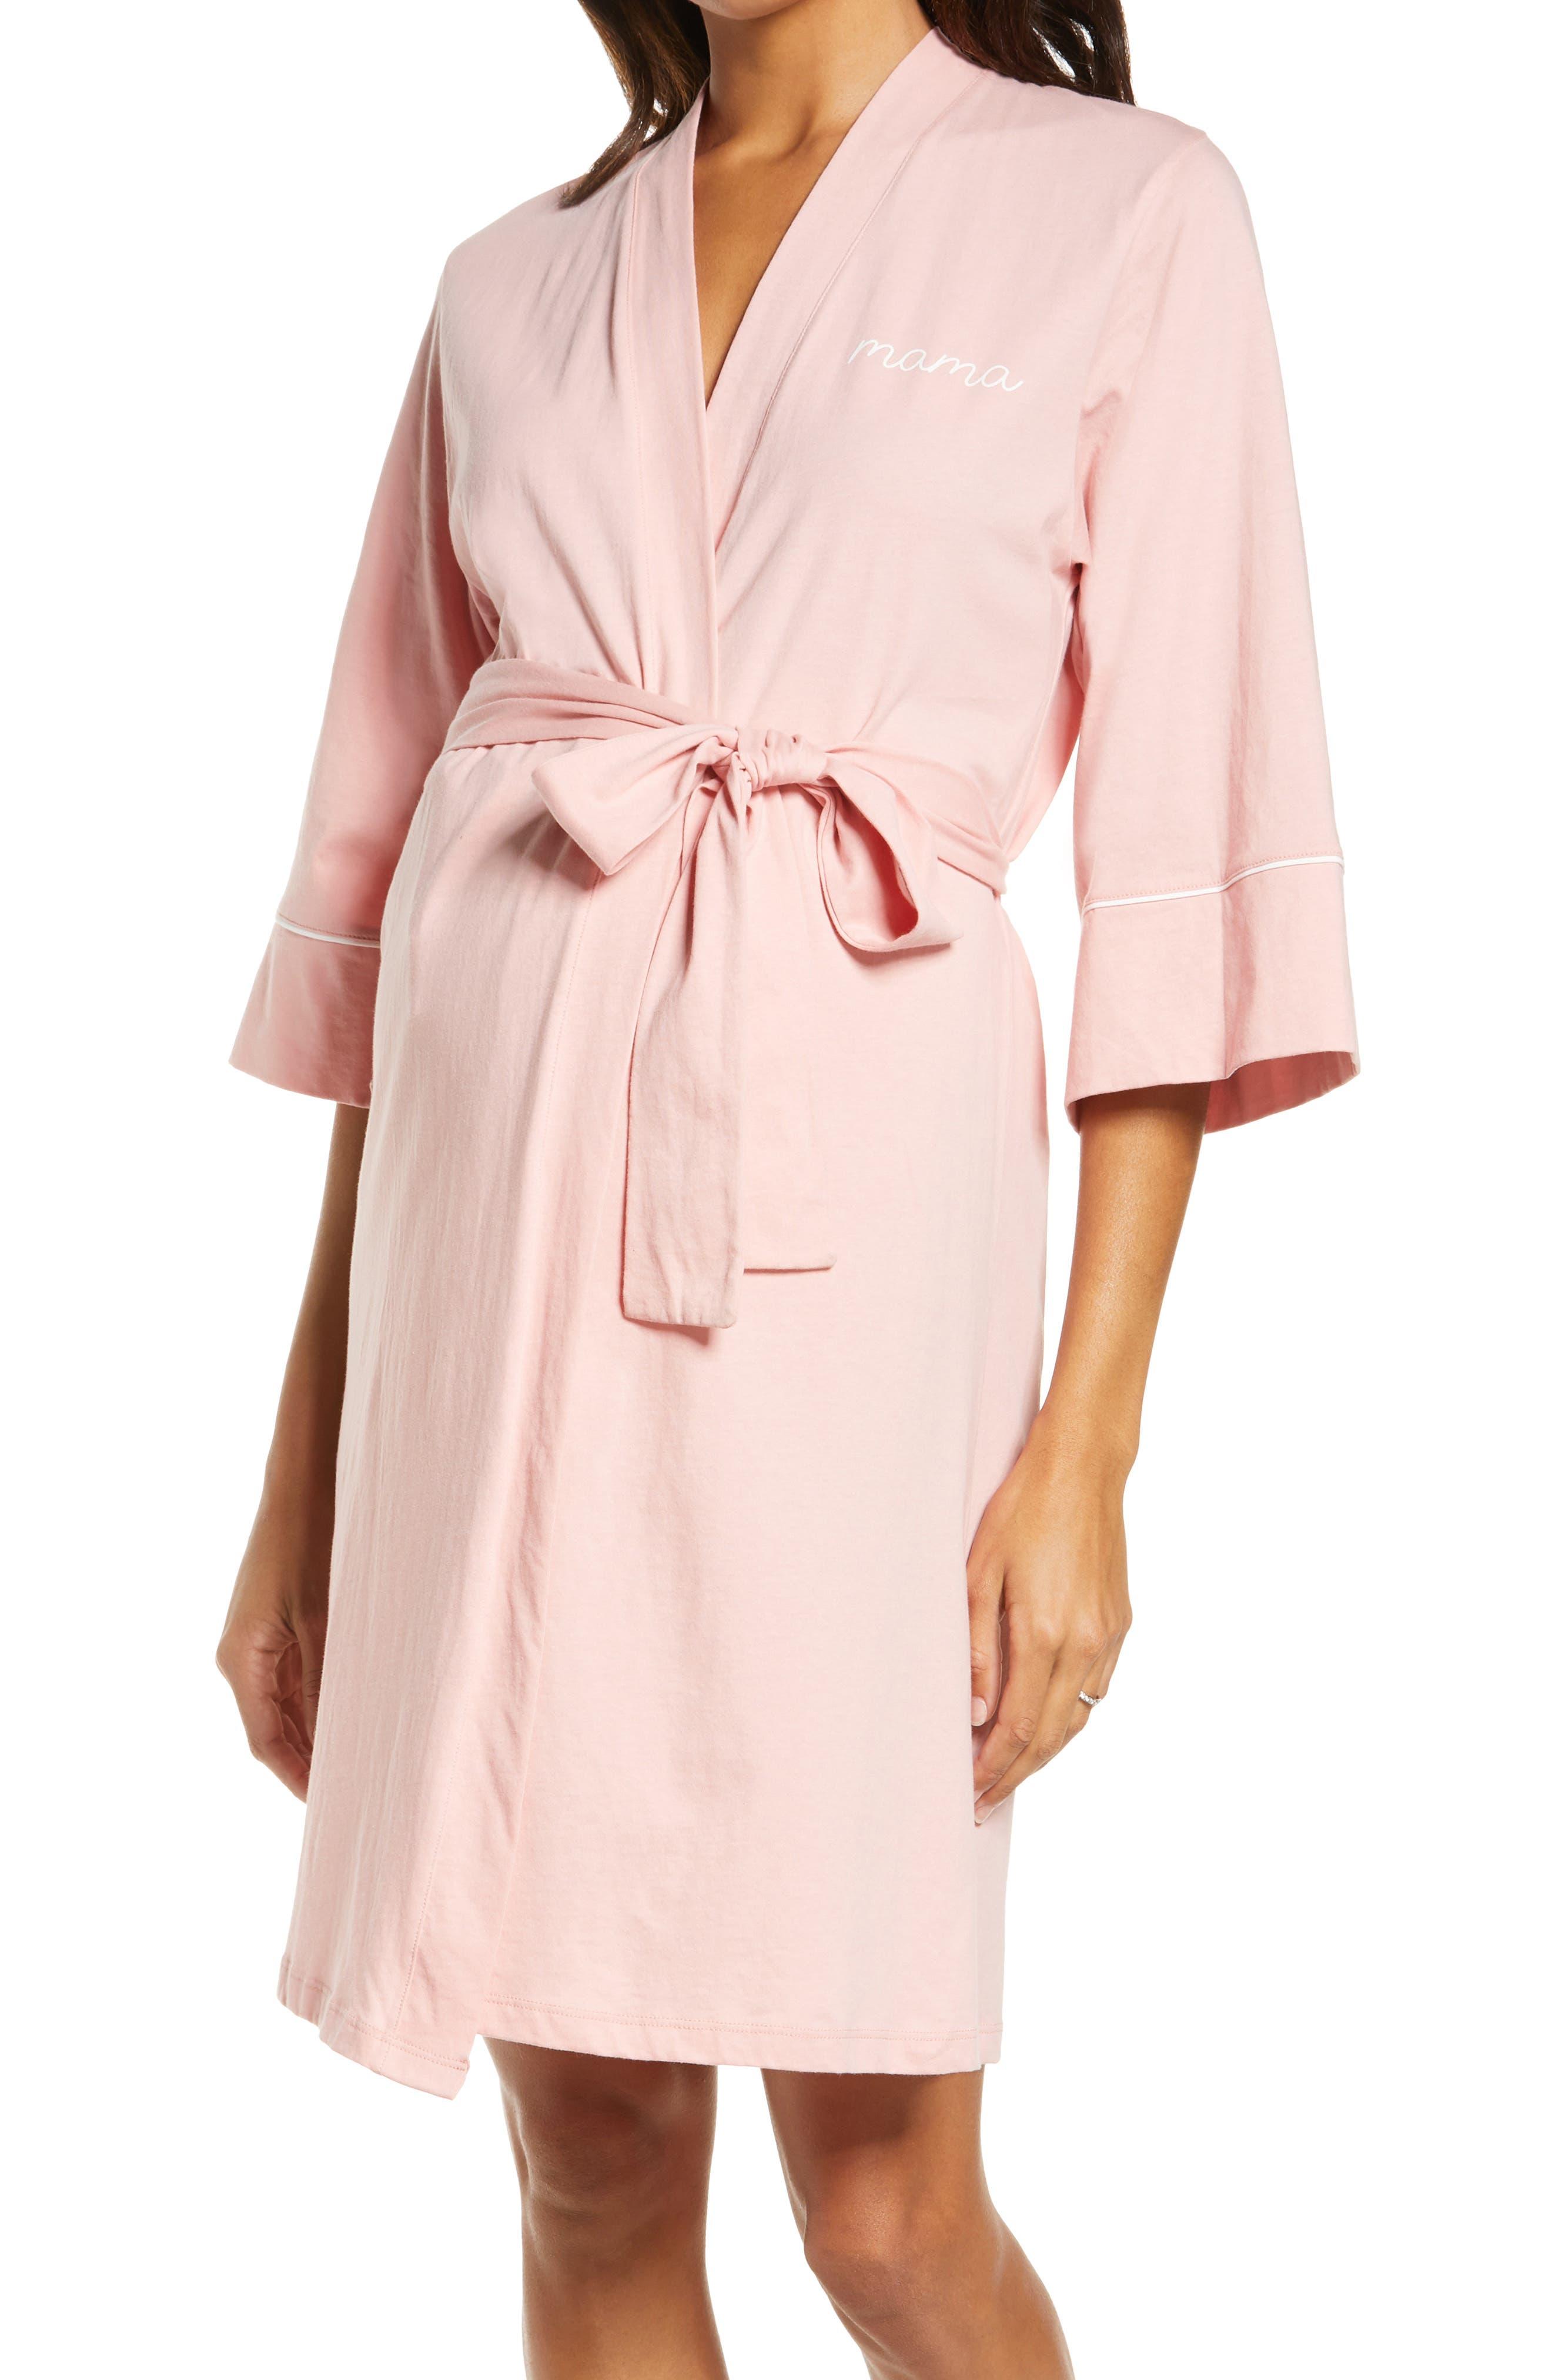 Mama Maternity/nursing Robe